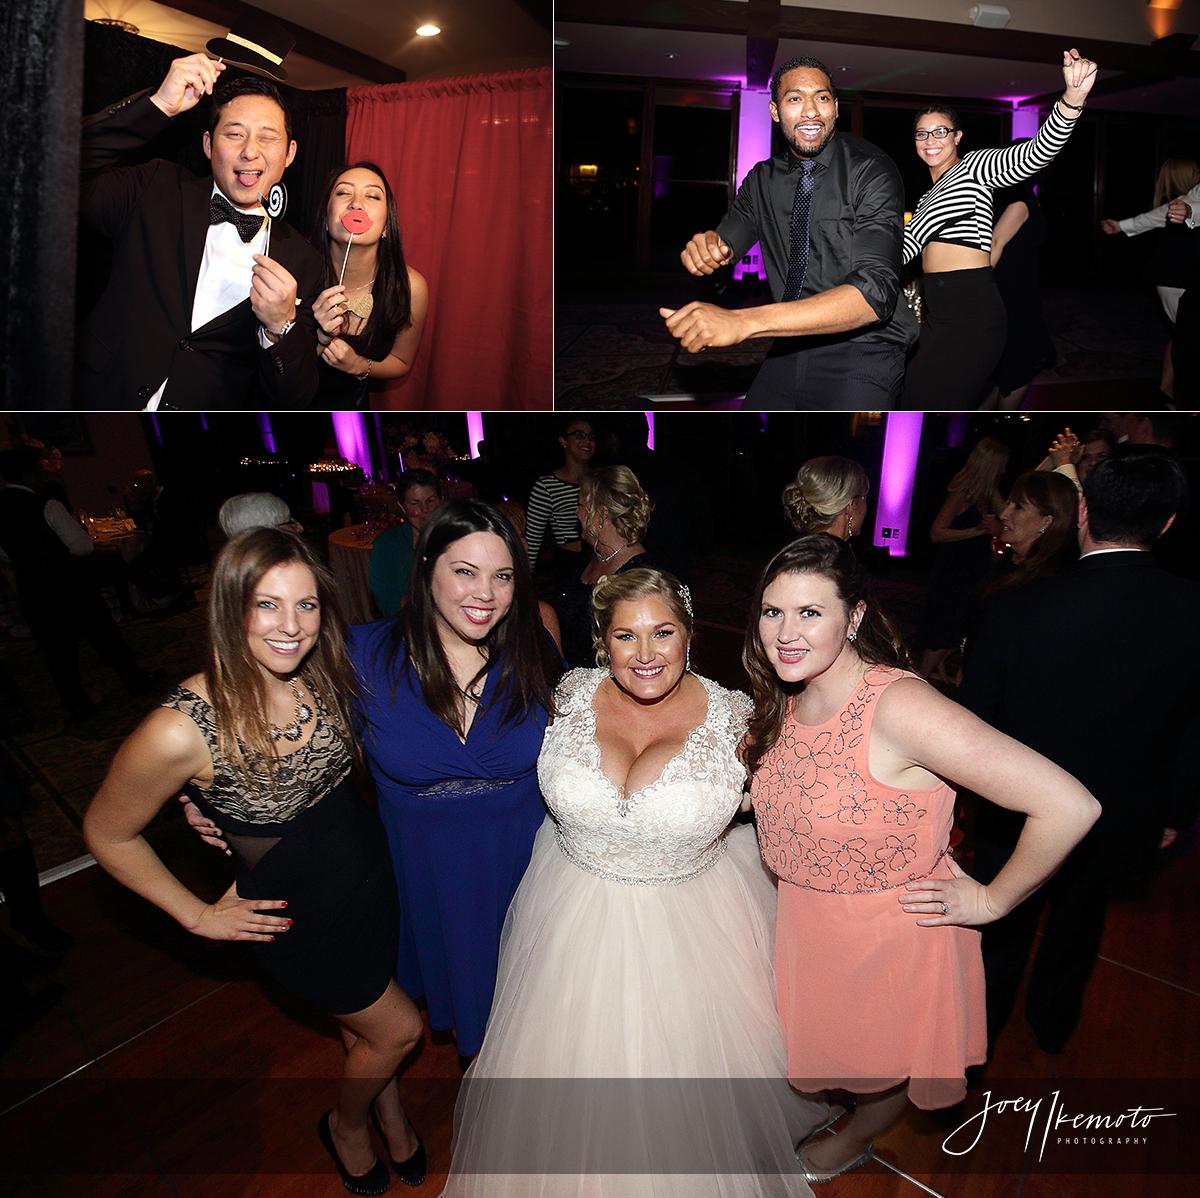 Wayfarers-Chapel-and-Palos-Verdes-Country-Club-Wedding_0066_Blog-Collage-1453340529598